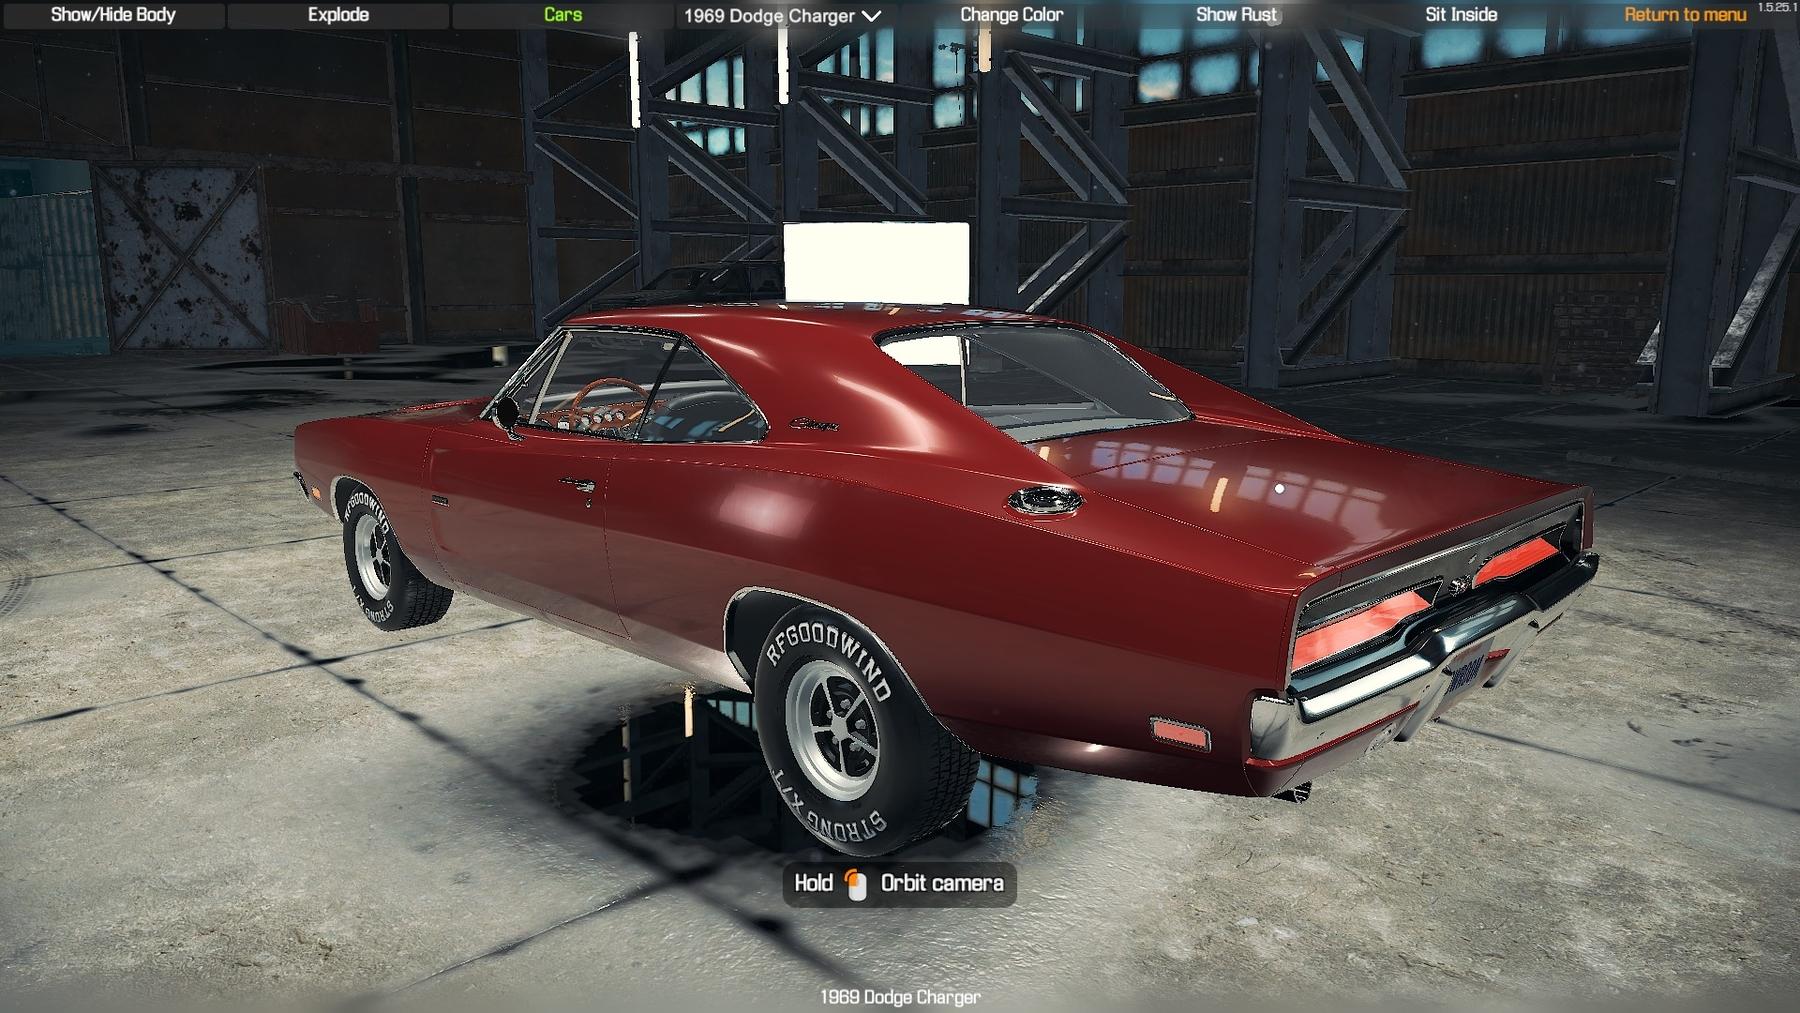 Dodge Viper Tires >> Dodge Charger 1969 - CMS 2018 Cars - Car Mechanic Simulator 2018 - Mods - Mods for Games ...